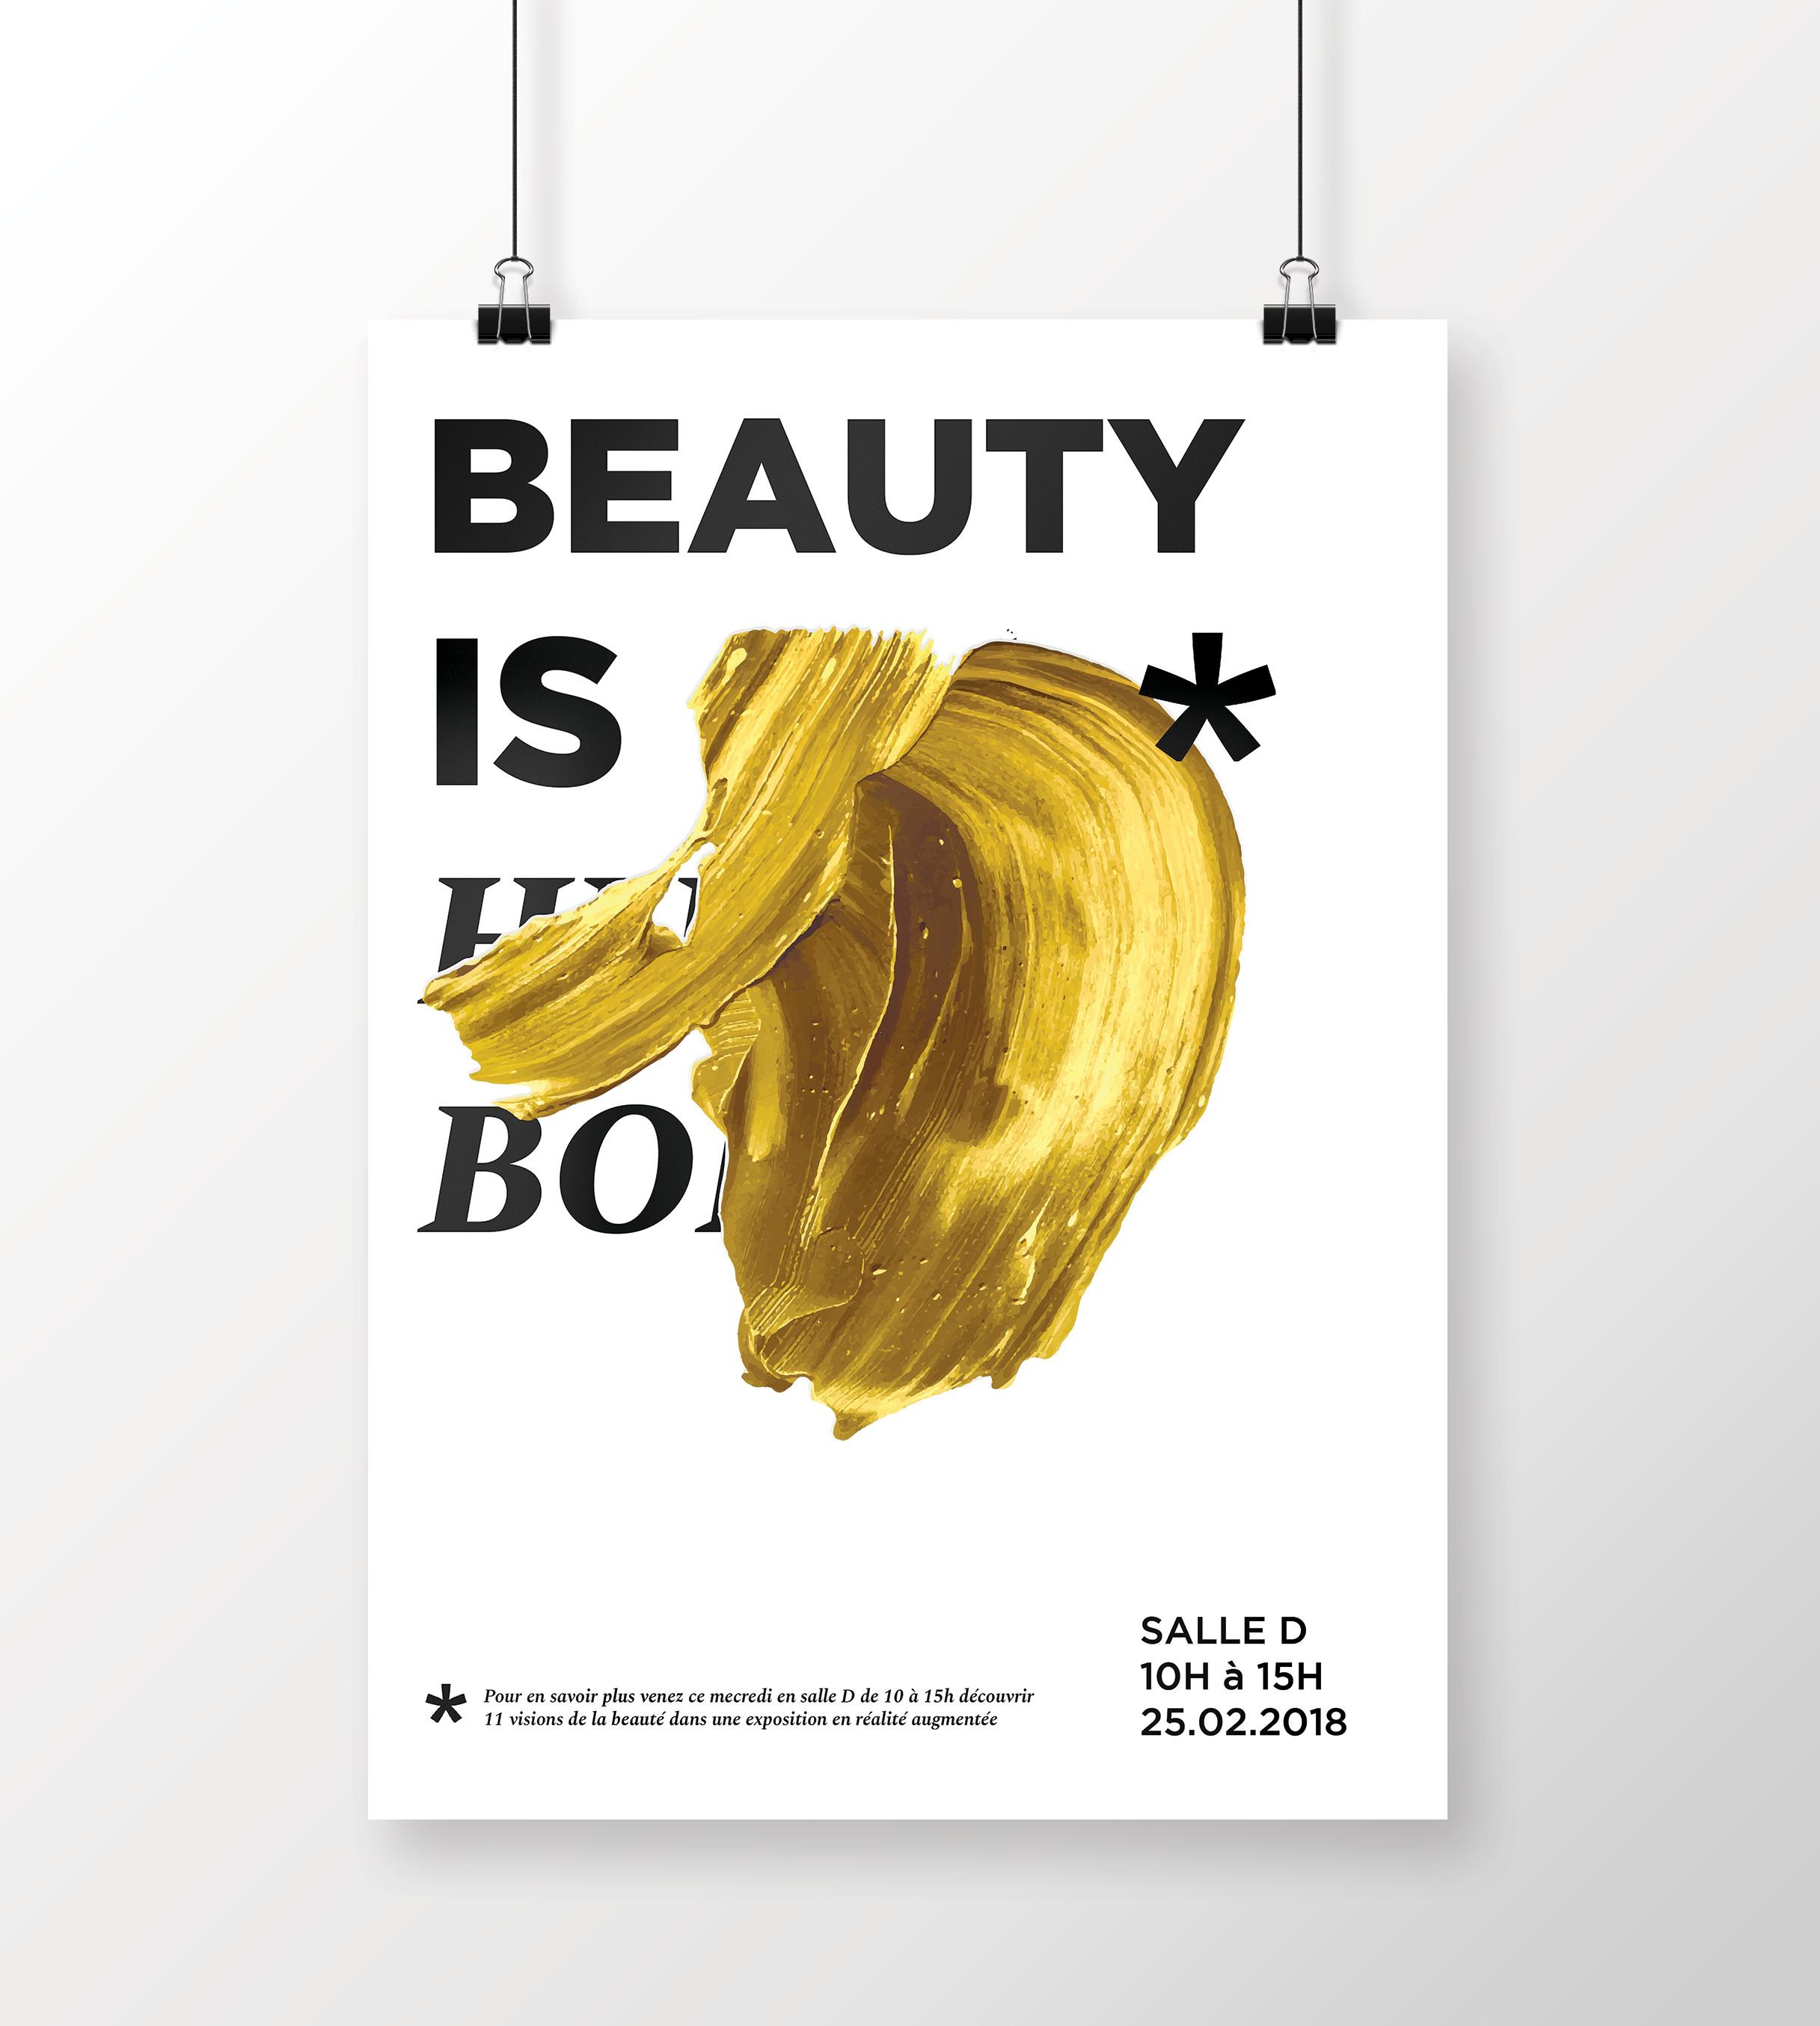 Beauty_humanbody_poster.jpg